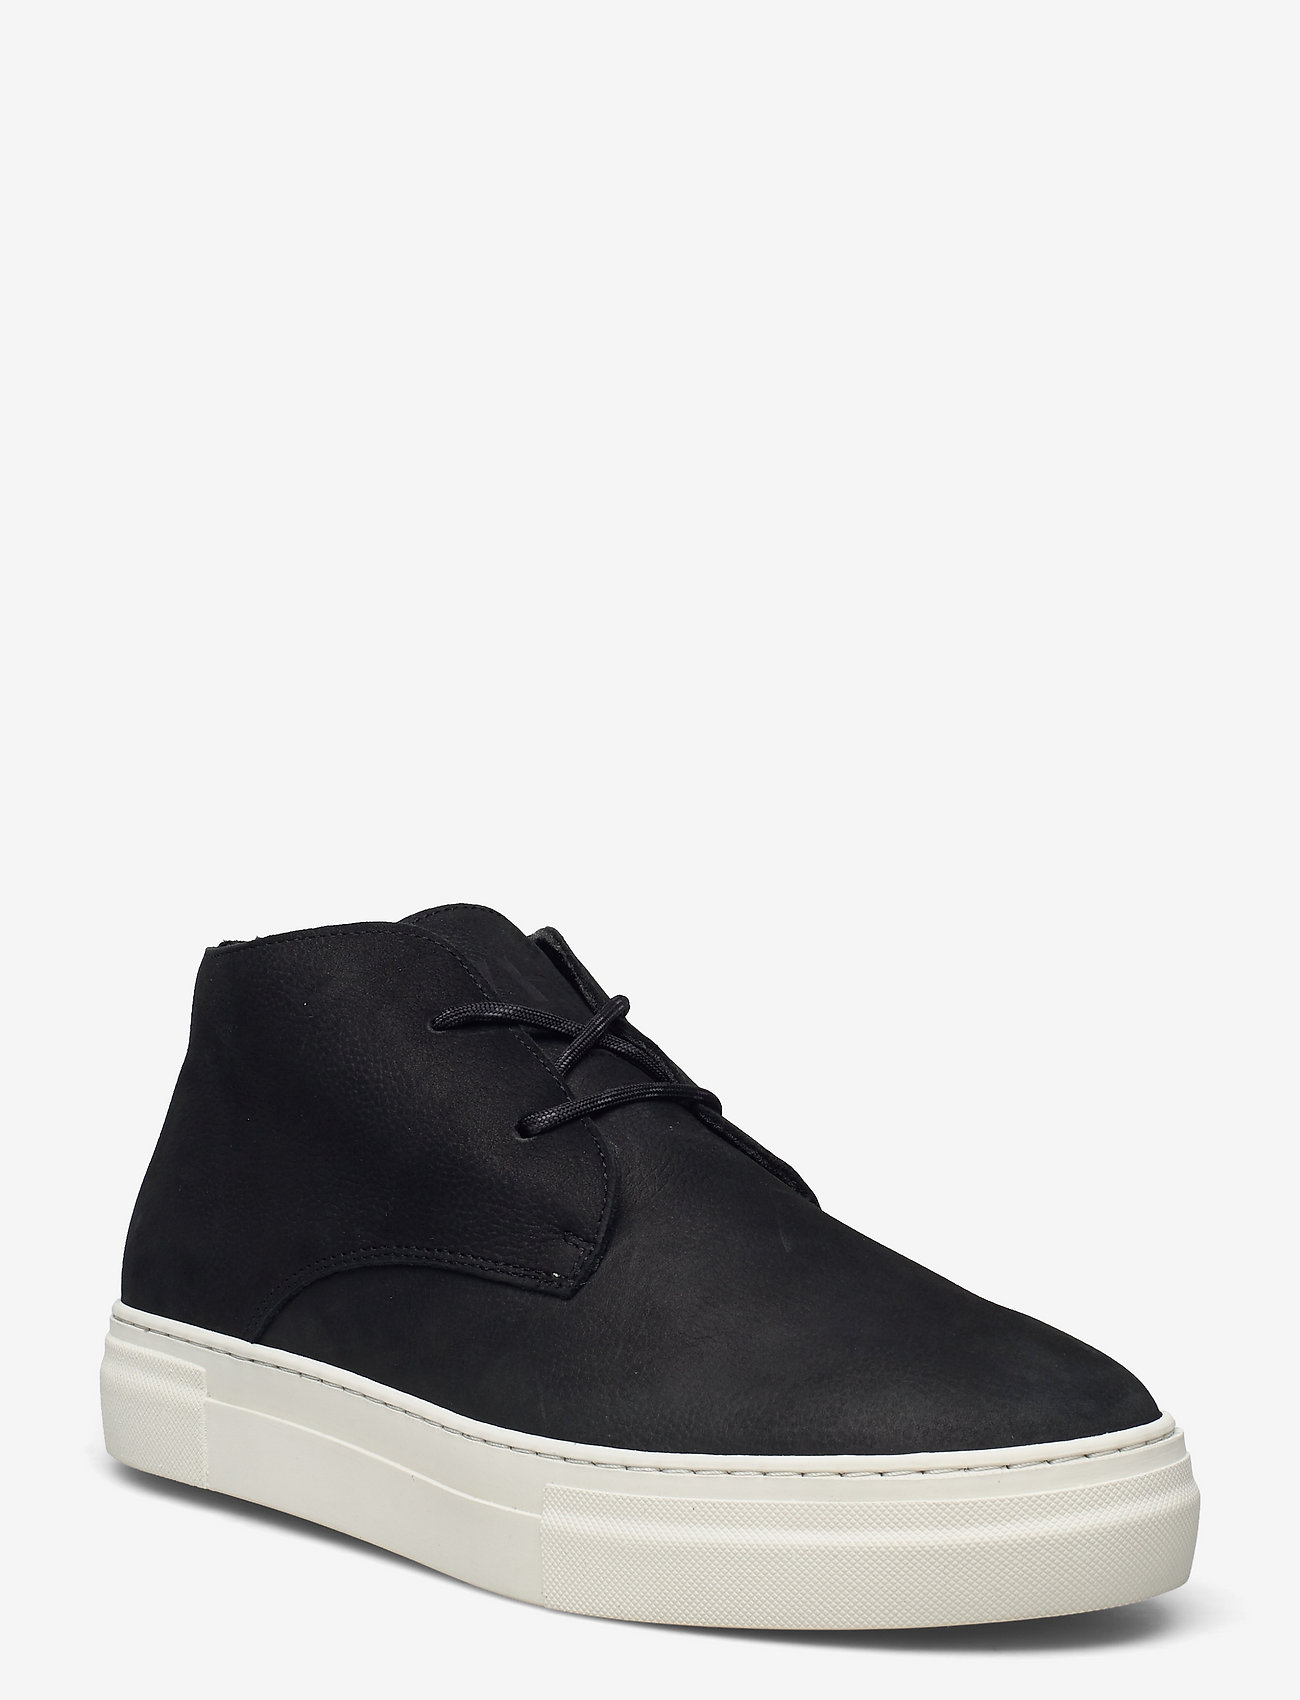 Selected Homme - SLHDAVID CHUNKY NUBUCK CHUKKA W - desert boots - black - 0